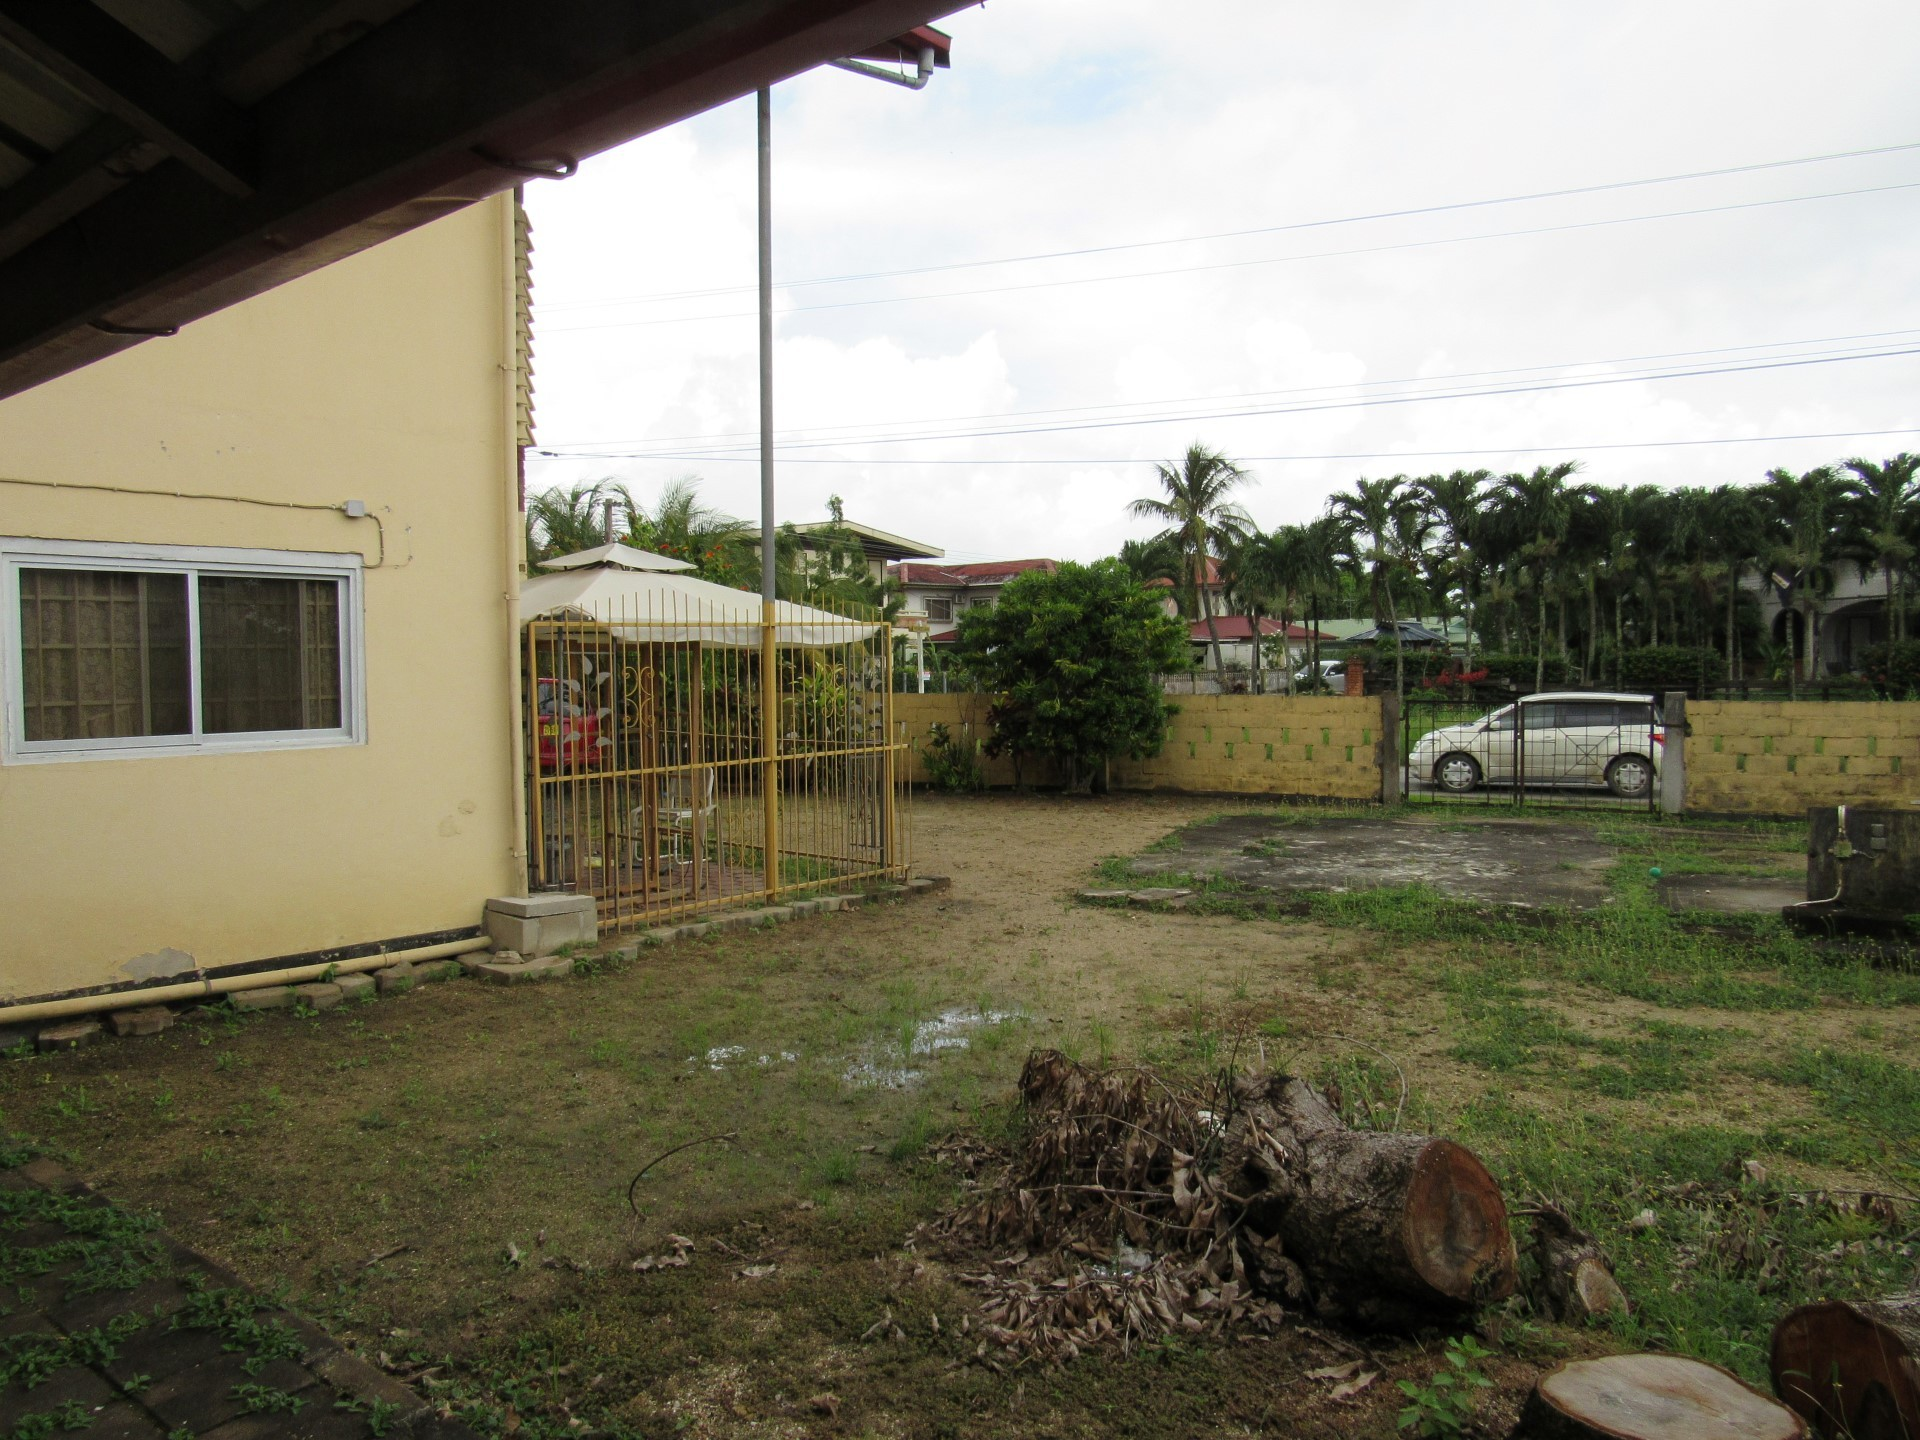 Henkielaan-32-Koopwoning-Terzol-Vastgoed-Paramaribo-Suriname-31